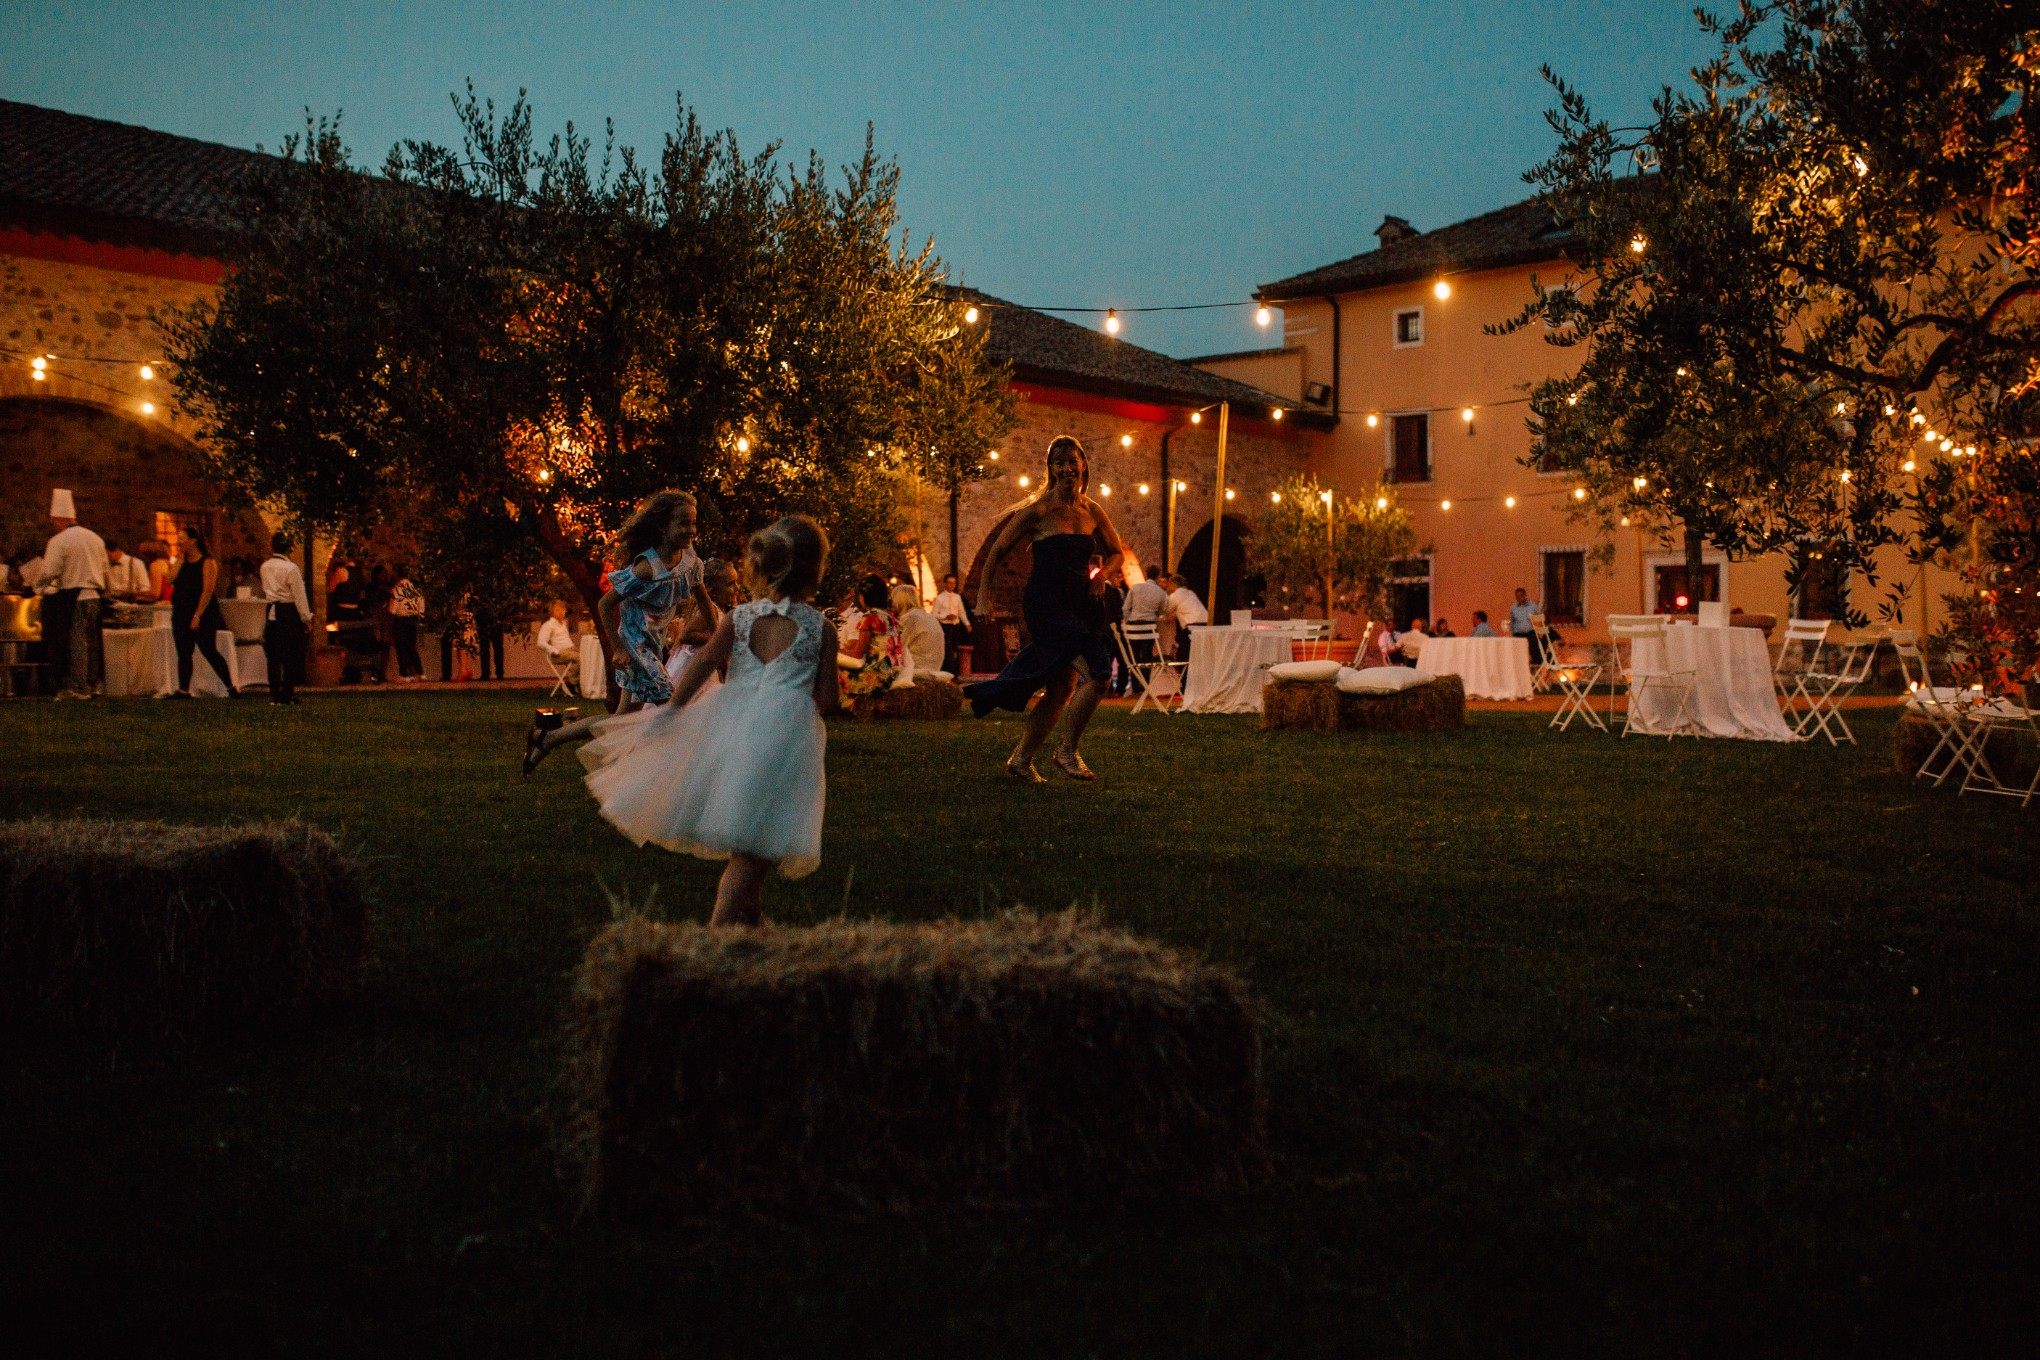 Italy-Gardasee-Tenuta-La-Presa-Pia-Anna-Christian-Photography-BP-A-103.jpg